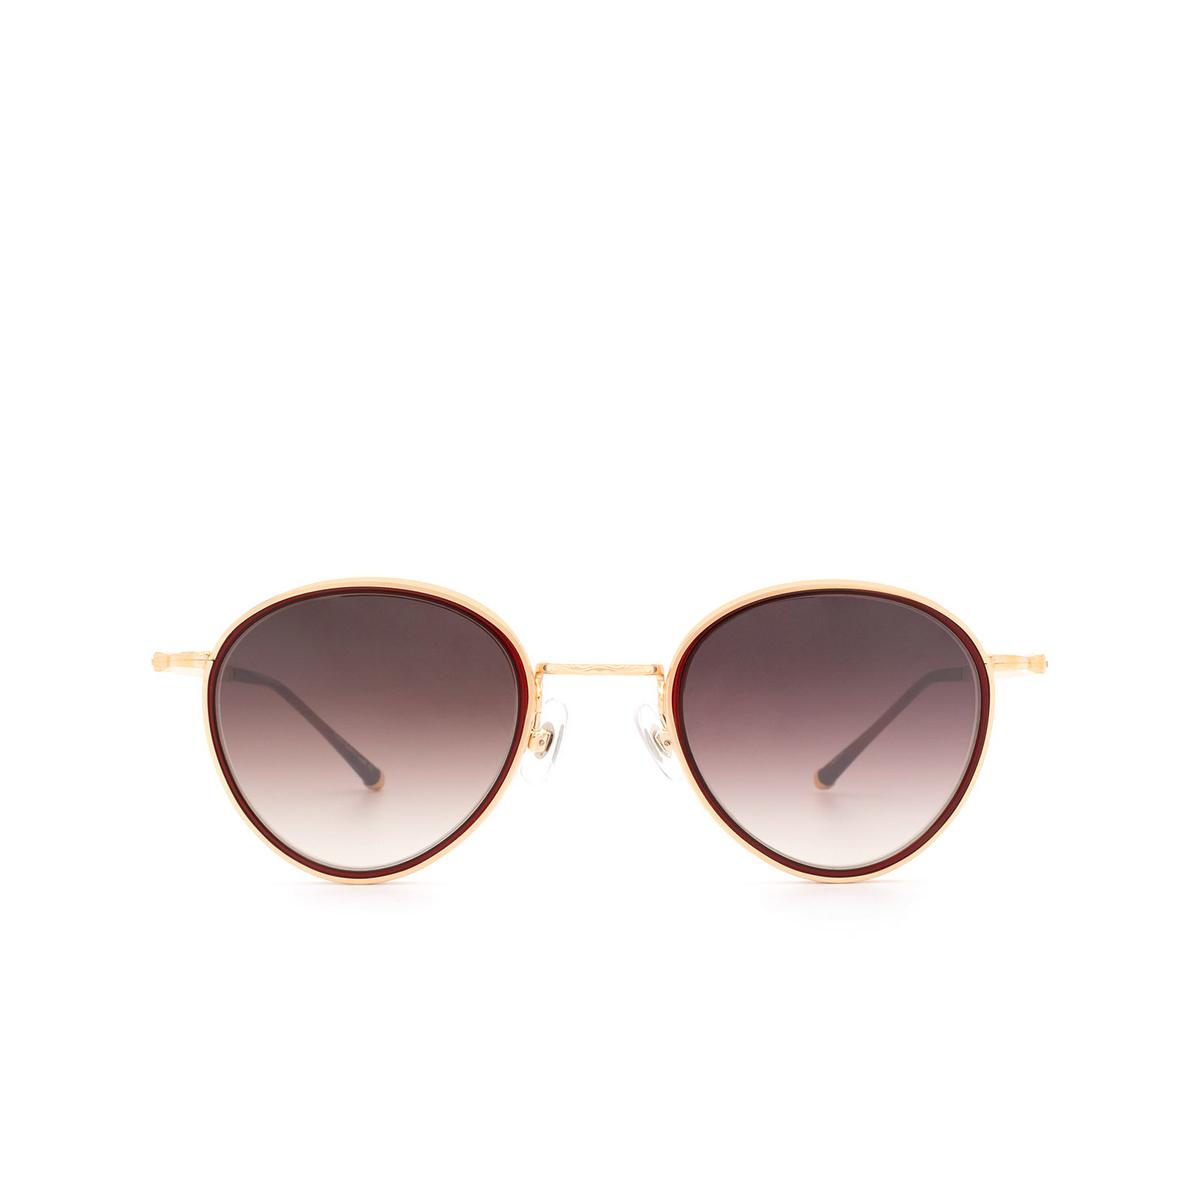 Matsuda® Round Sunglasses: M3070 color Bordeaux / Rose Gold Bor-rg.